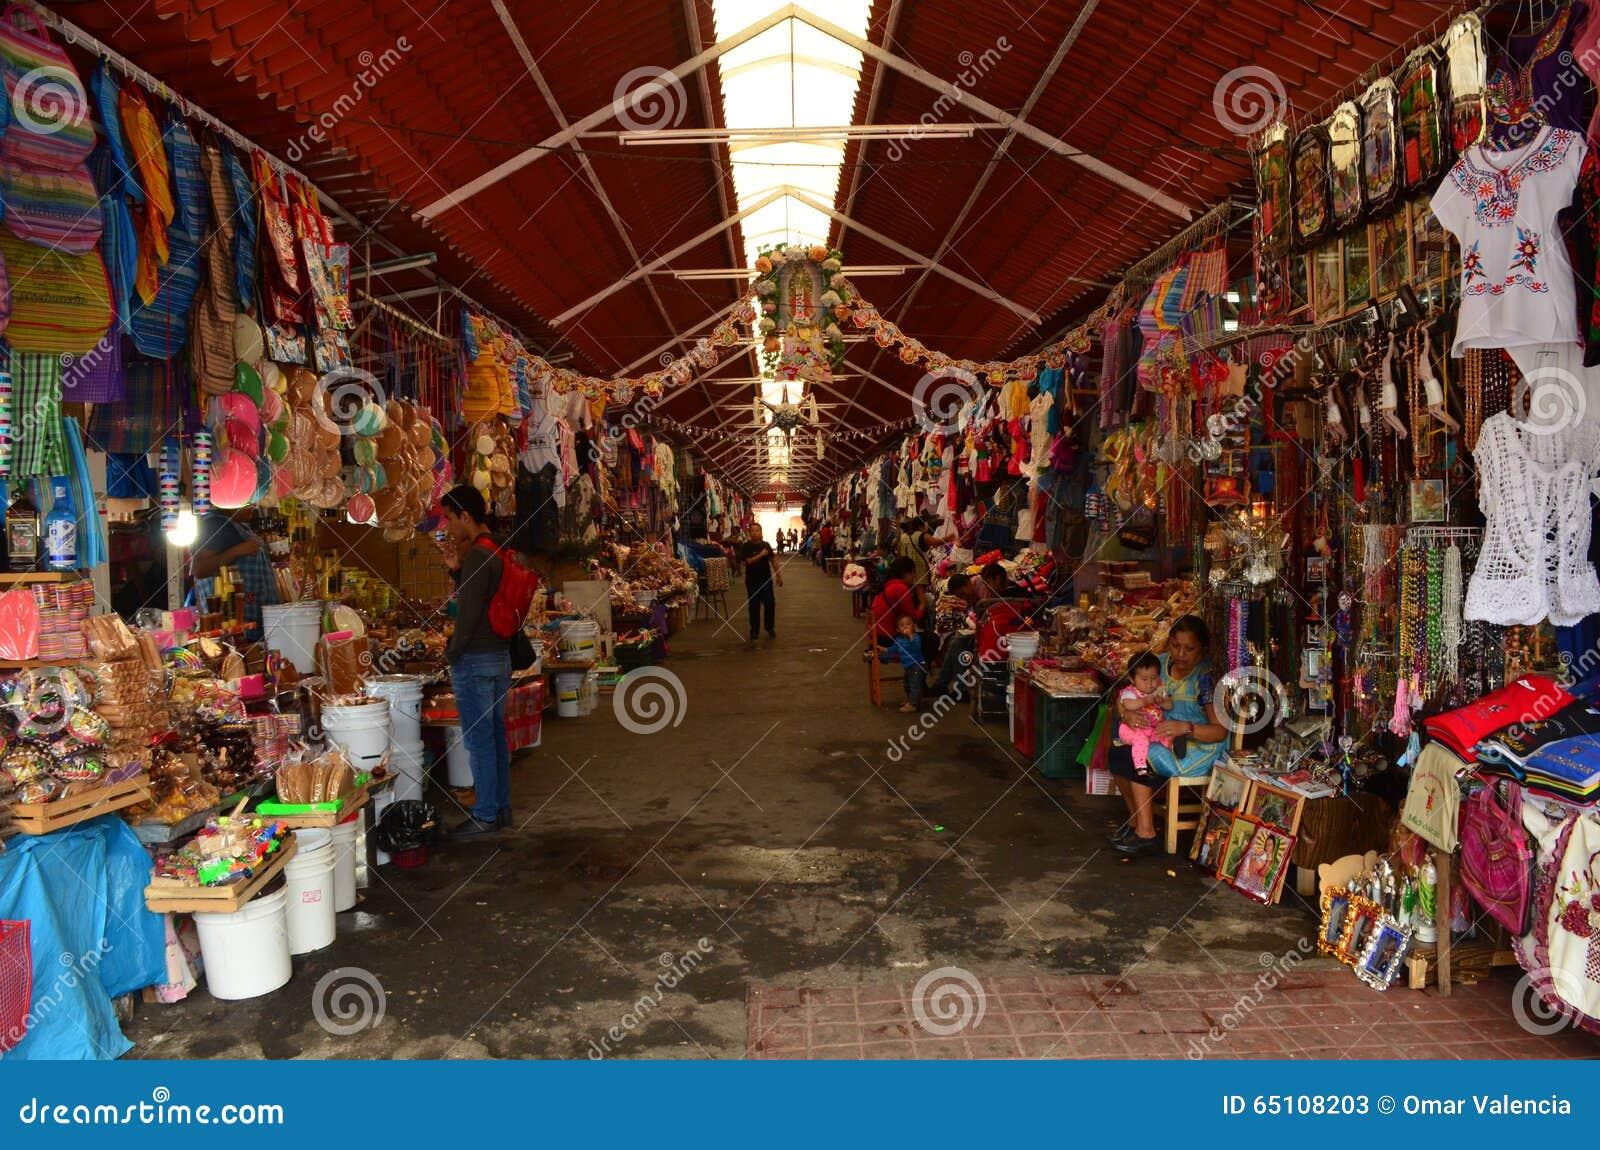 Market in the downtown of San Juan Nuevo